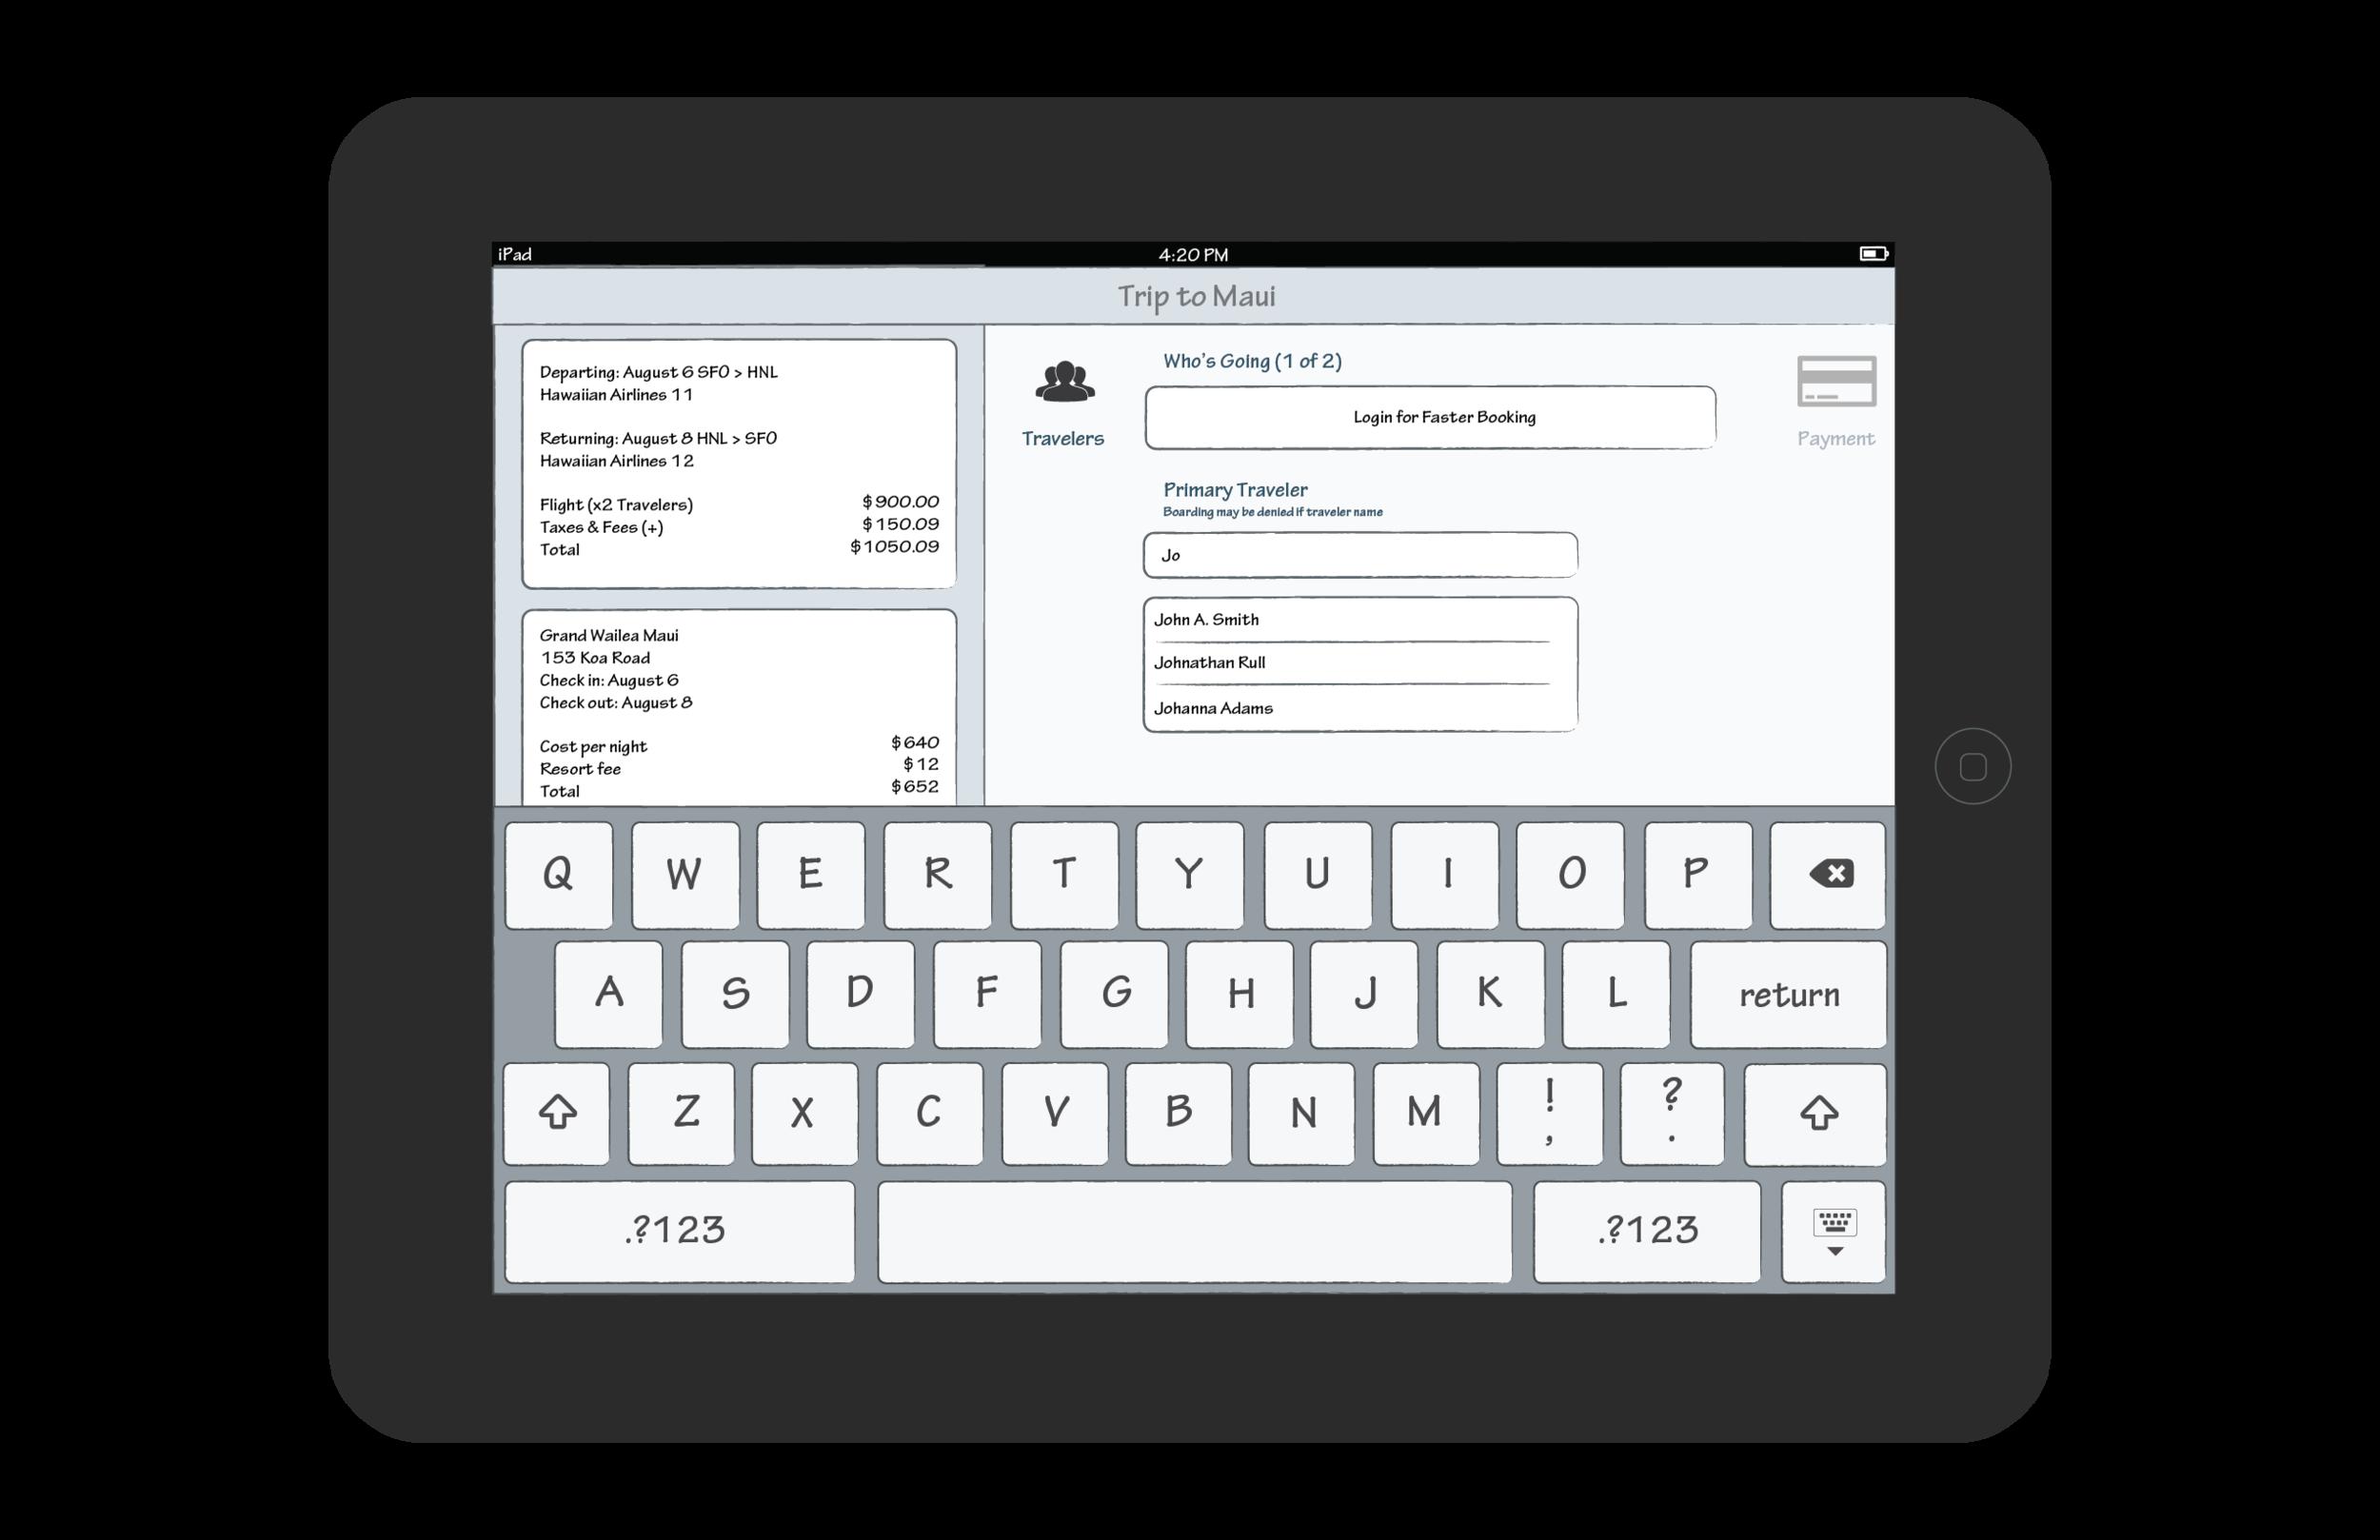 iPad_CKO_Wireframe_01 Enter Traveler One.png